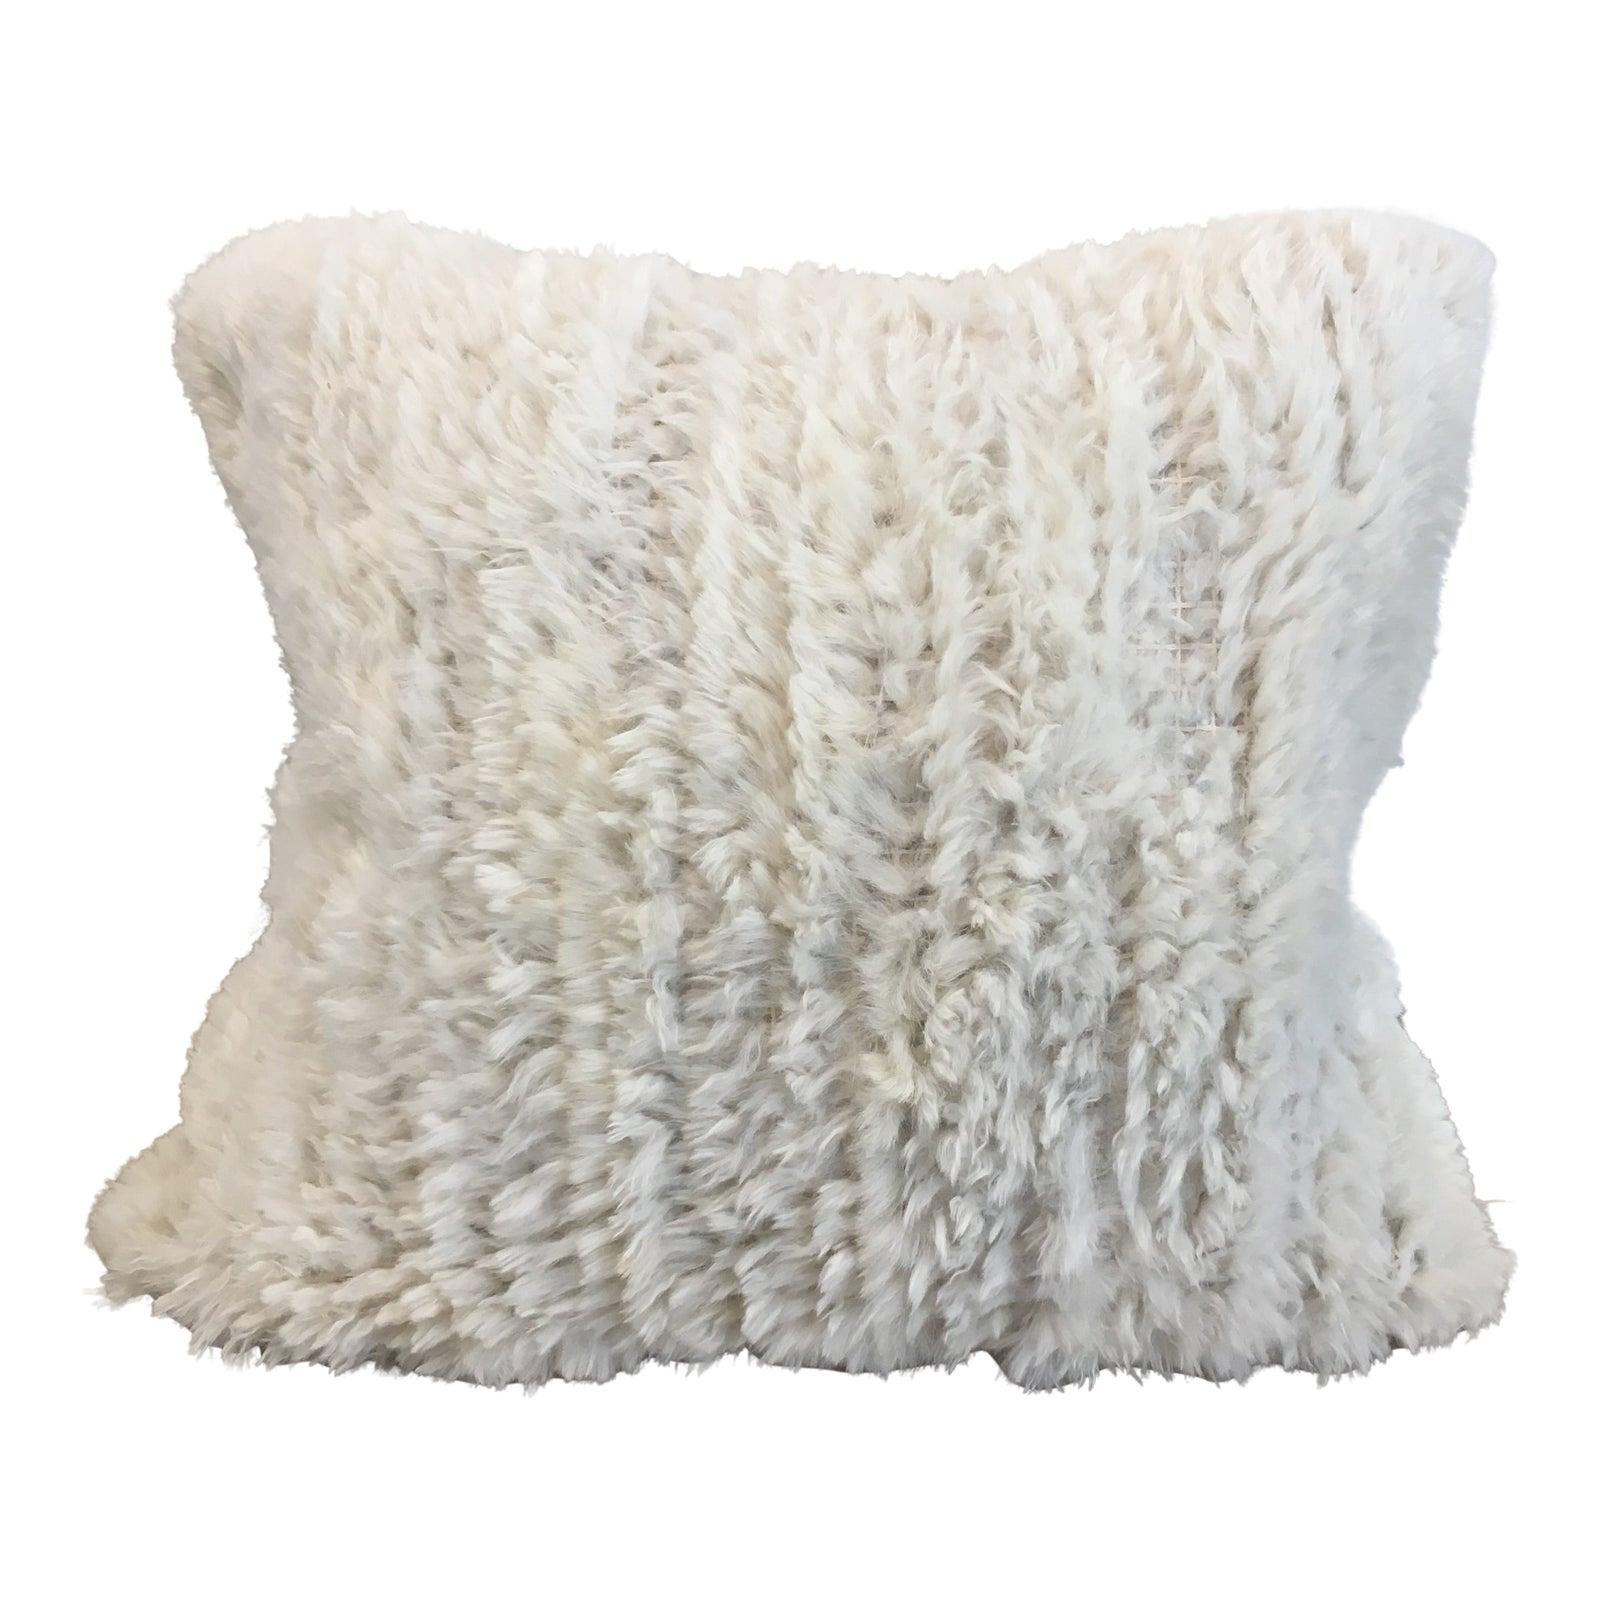 Adrienne Landau Square Rabbit Fur Pillow Chairish